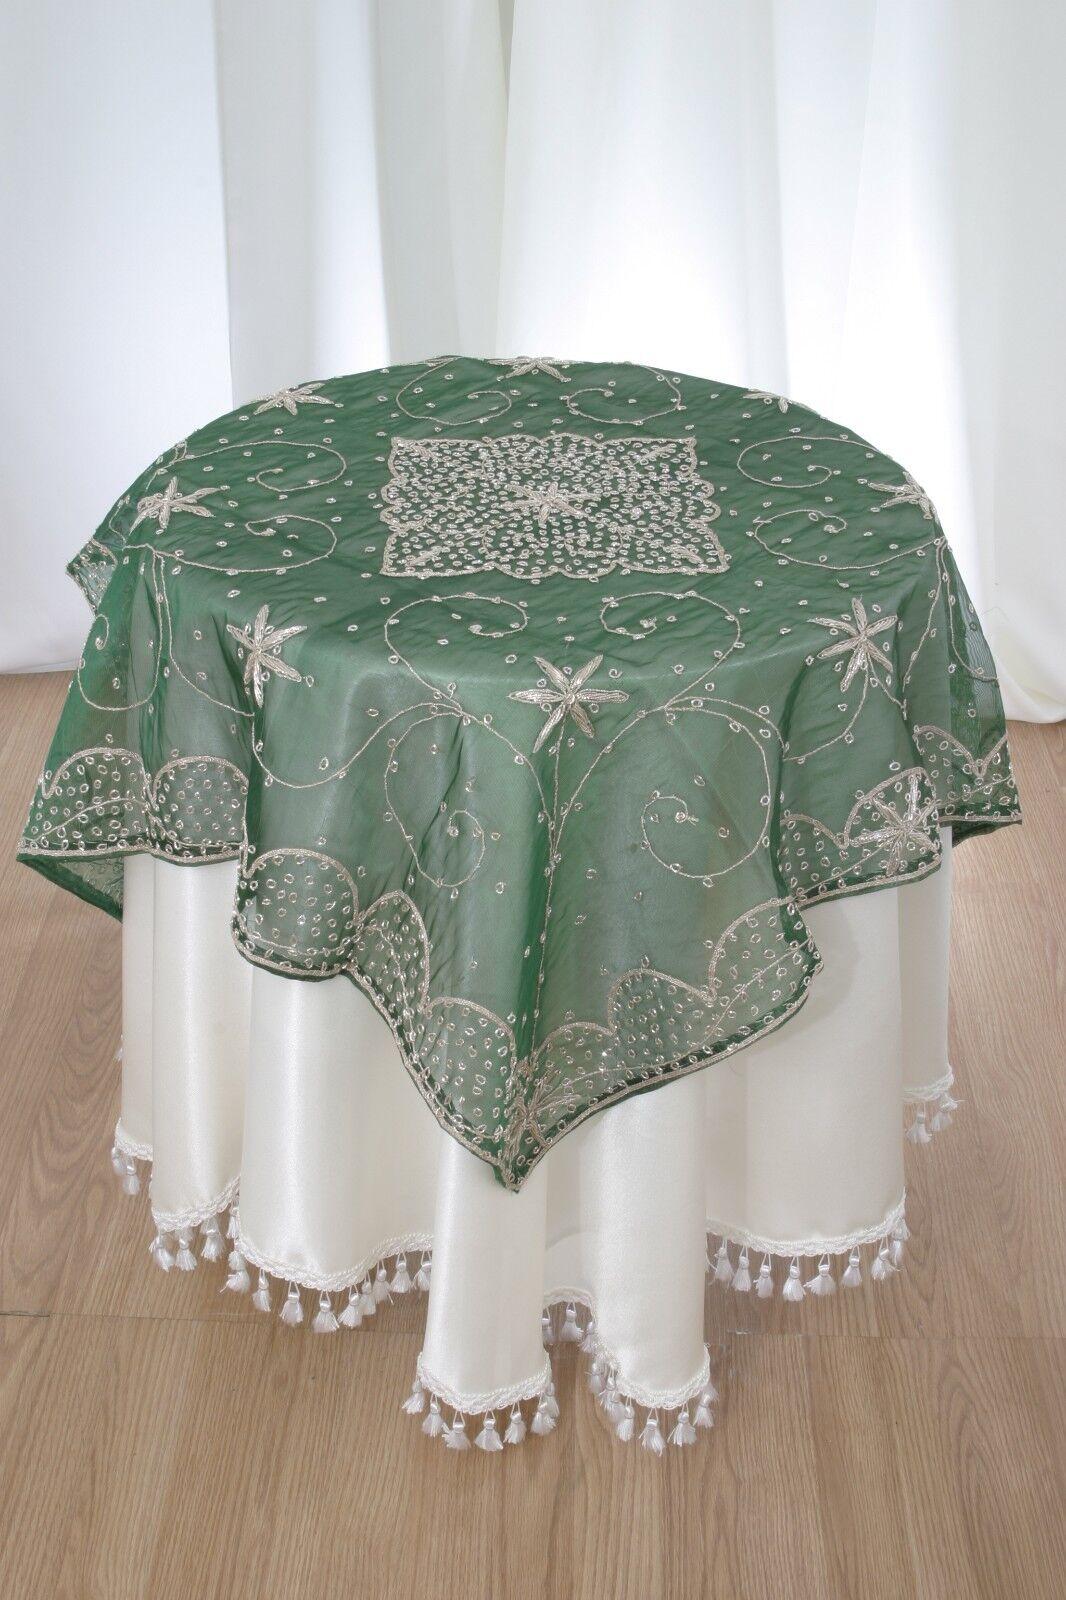 vert Sheer Organza avec fil d'argent de perles Table Topper 60 x60  carré